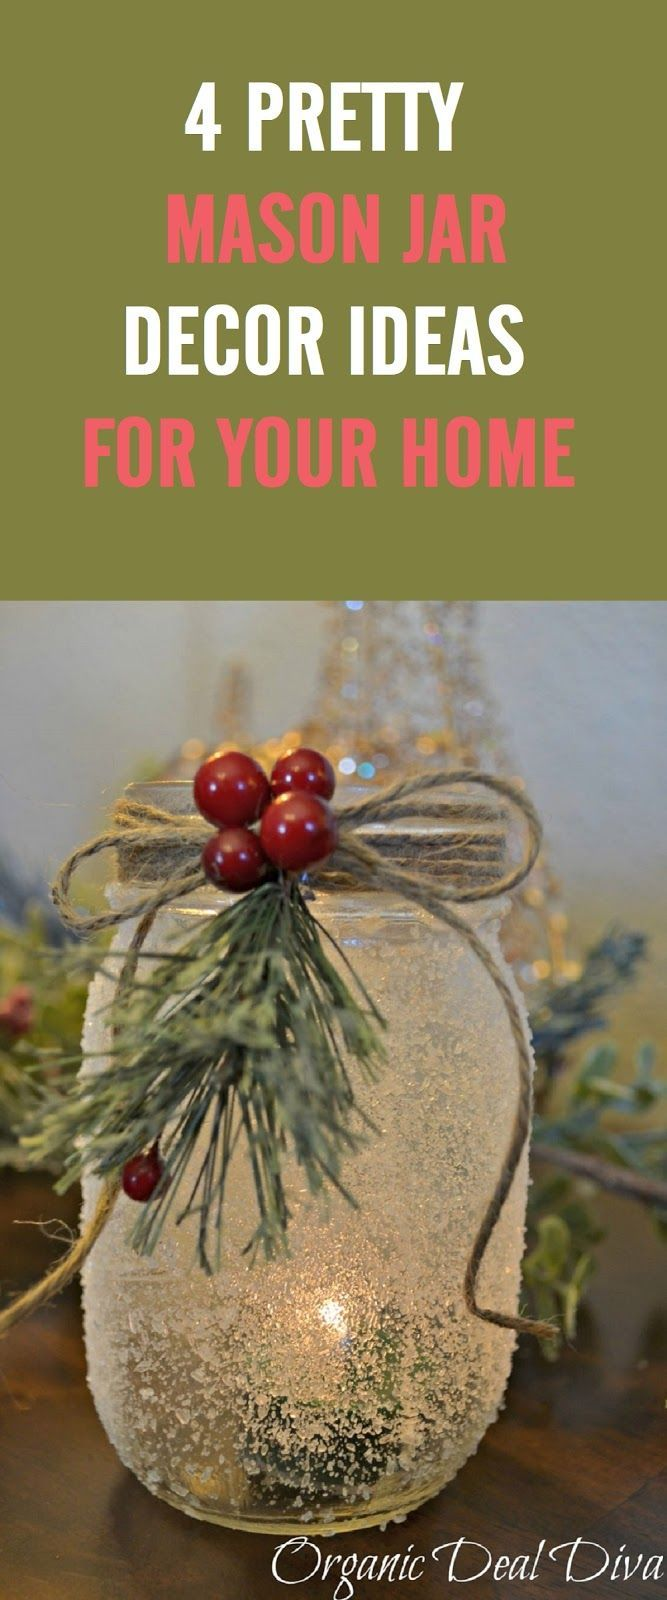 Masonjar Homedecor Christmasdecorationsdiy Mason Jar Decorations Christmas Mason Jars Christmas Jars